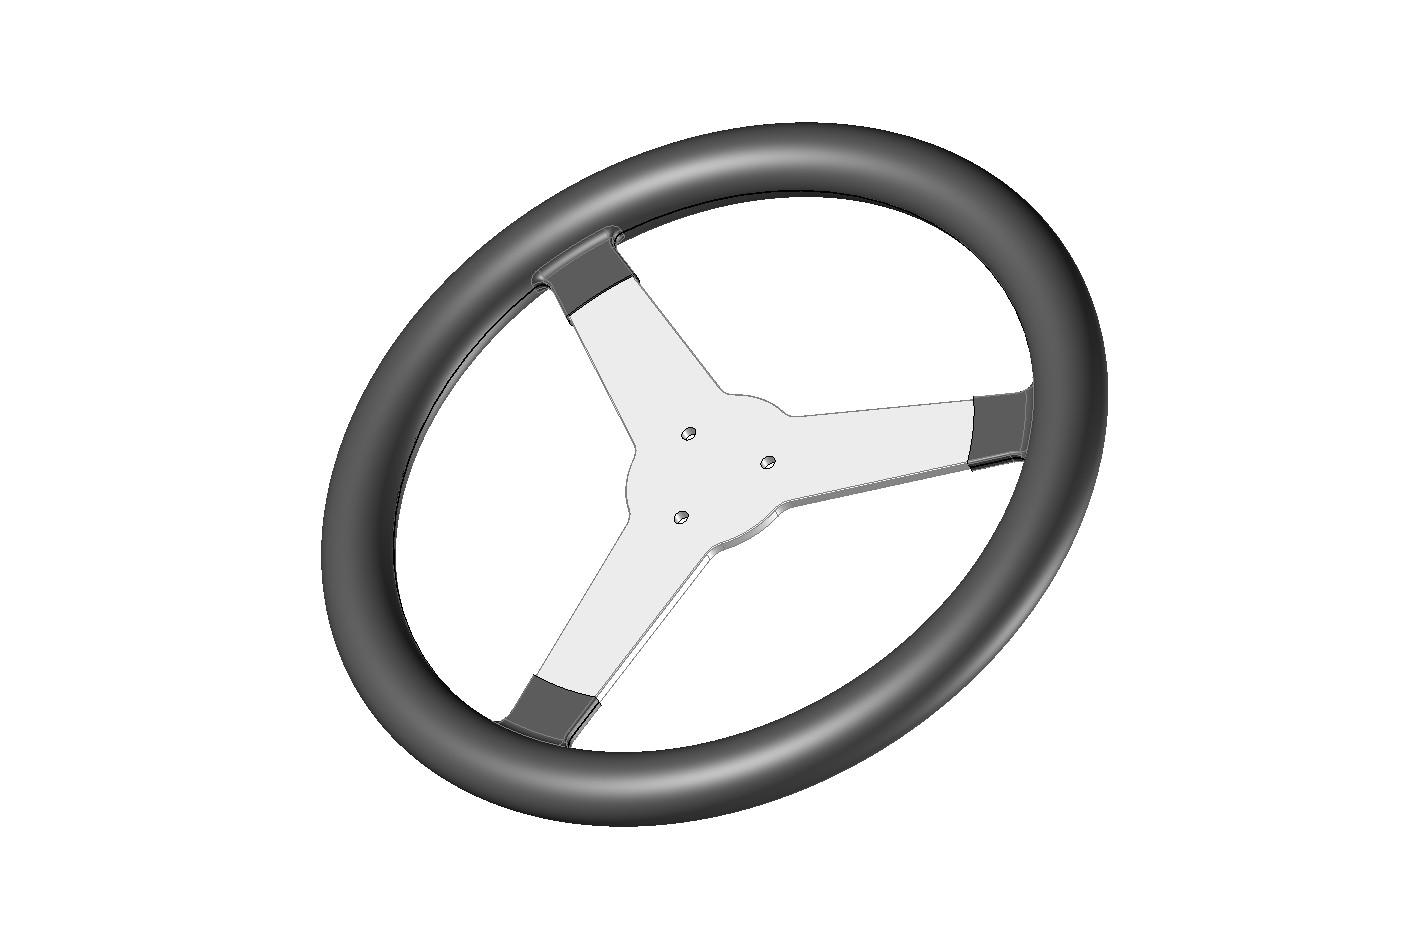 volant automobile